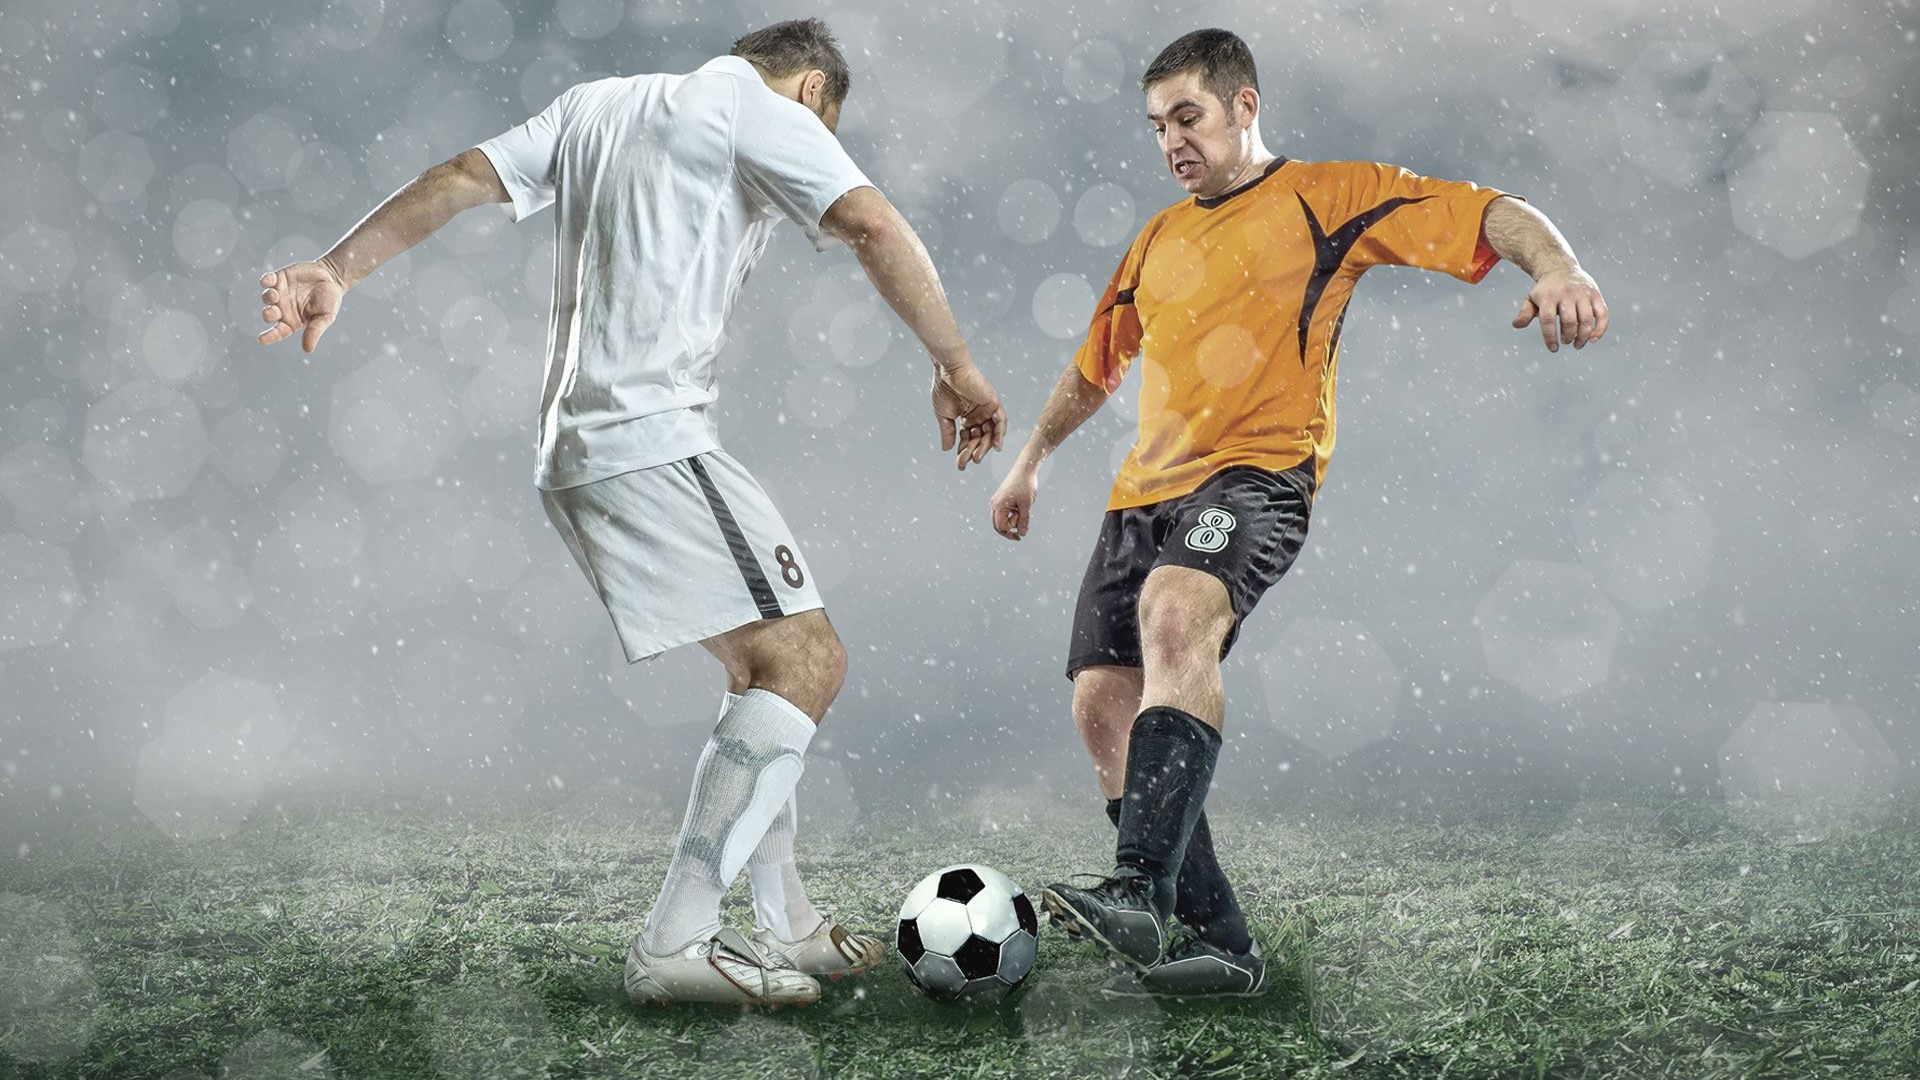 northampton-saints-vs-gloucester-rugby-live